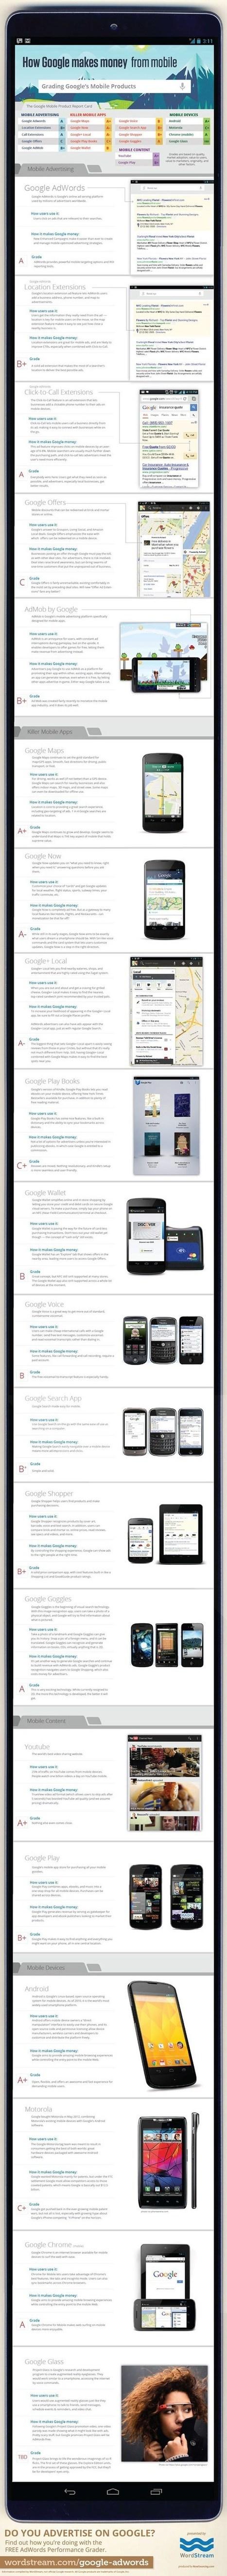 Infographie : Comment Google gagne de l'argent sur mobile   ALL OF GOOGLE PLUS WITH PHILIPPE TREBAUL ON SCOOP.IT   Scoop.it